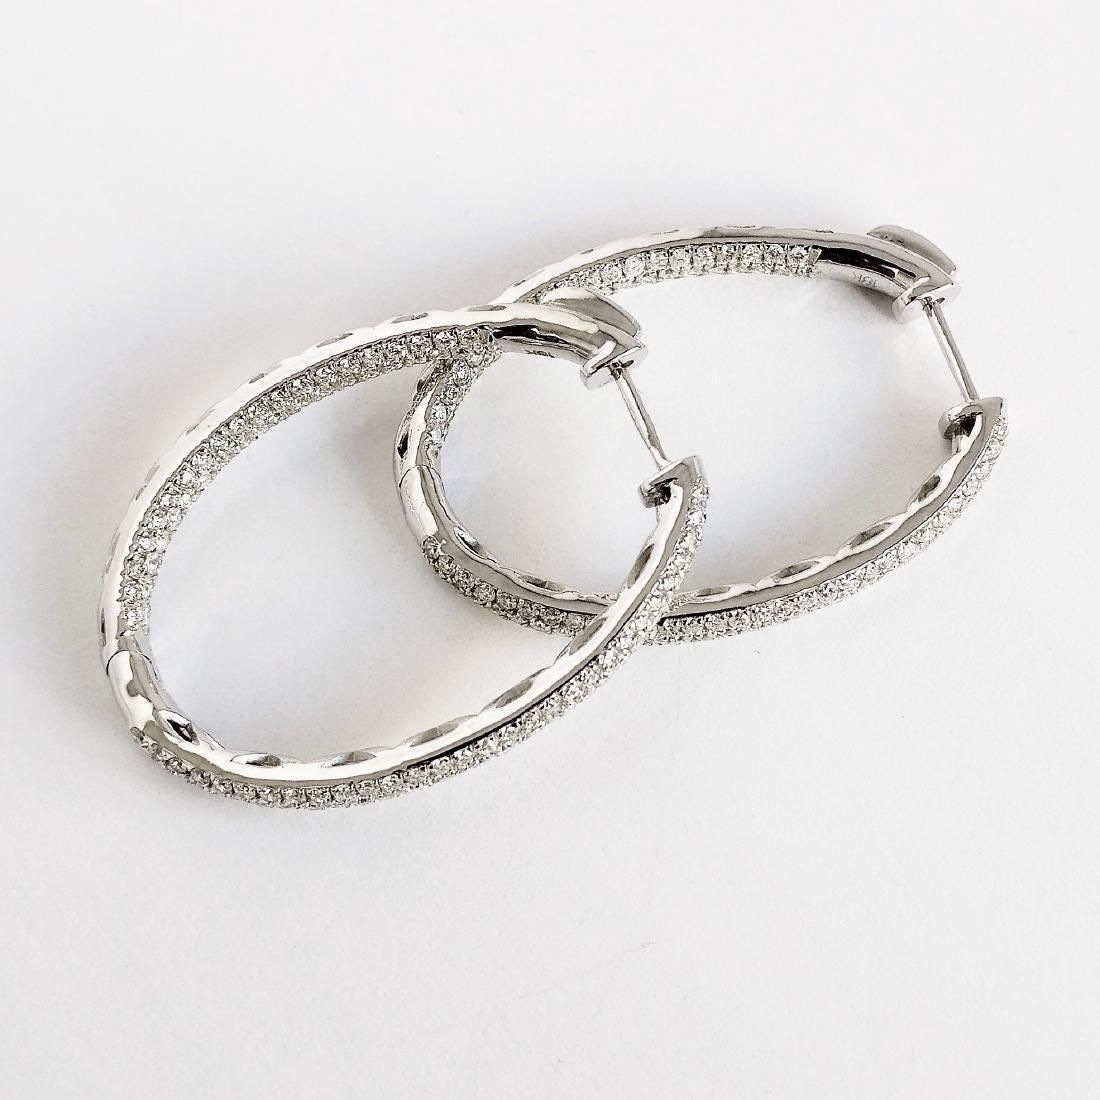 Ladies Earrings with Diamonds total 5.84 ct - 6